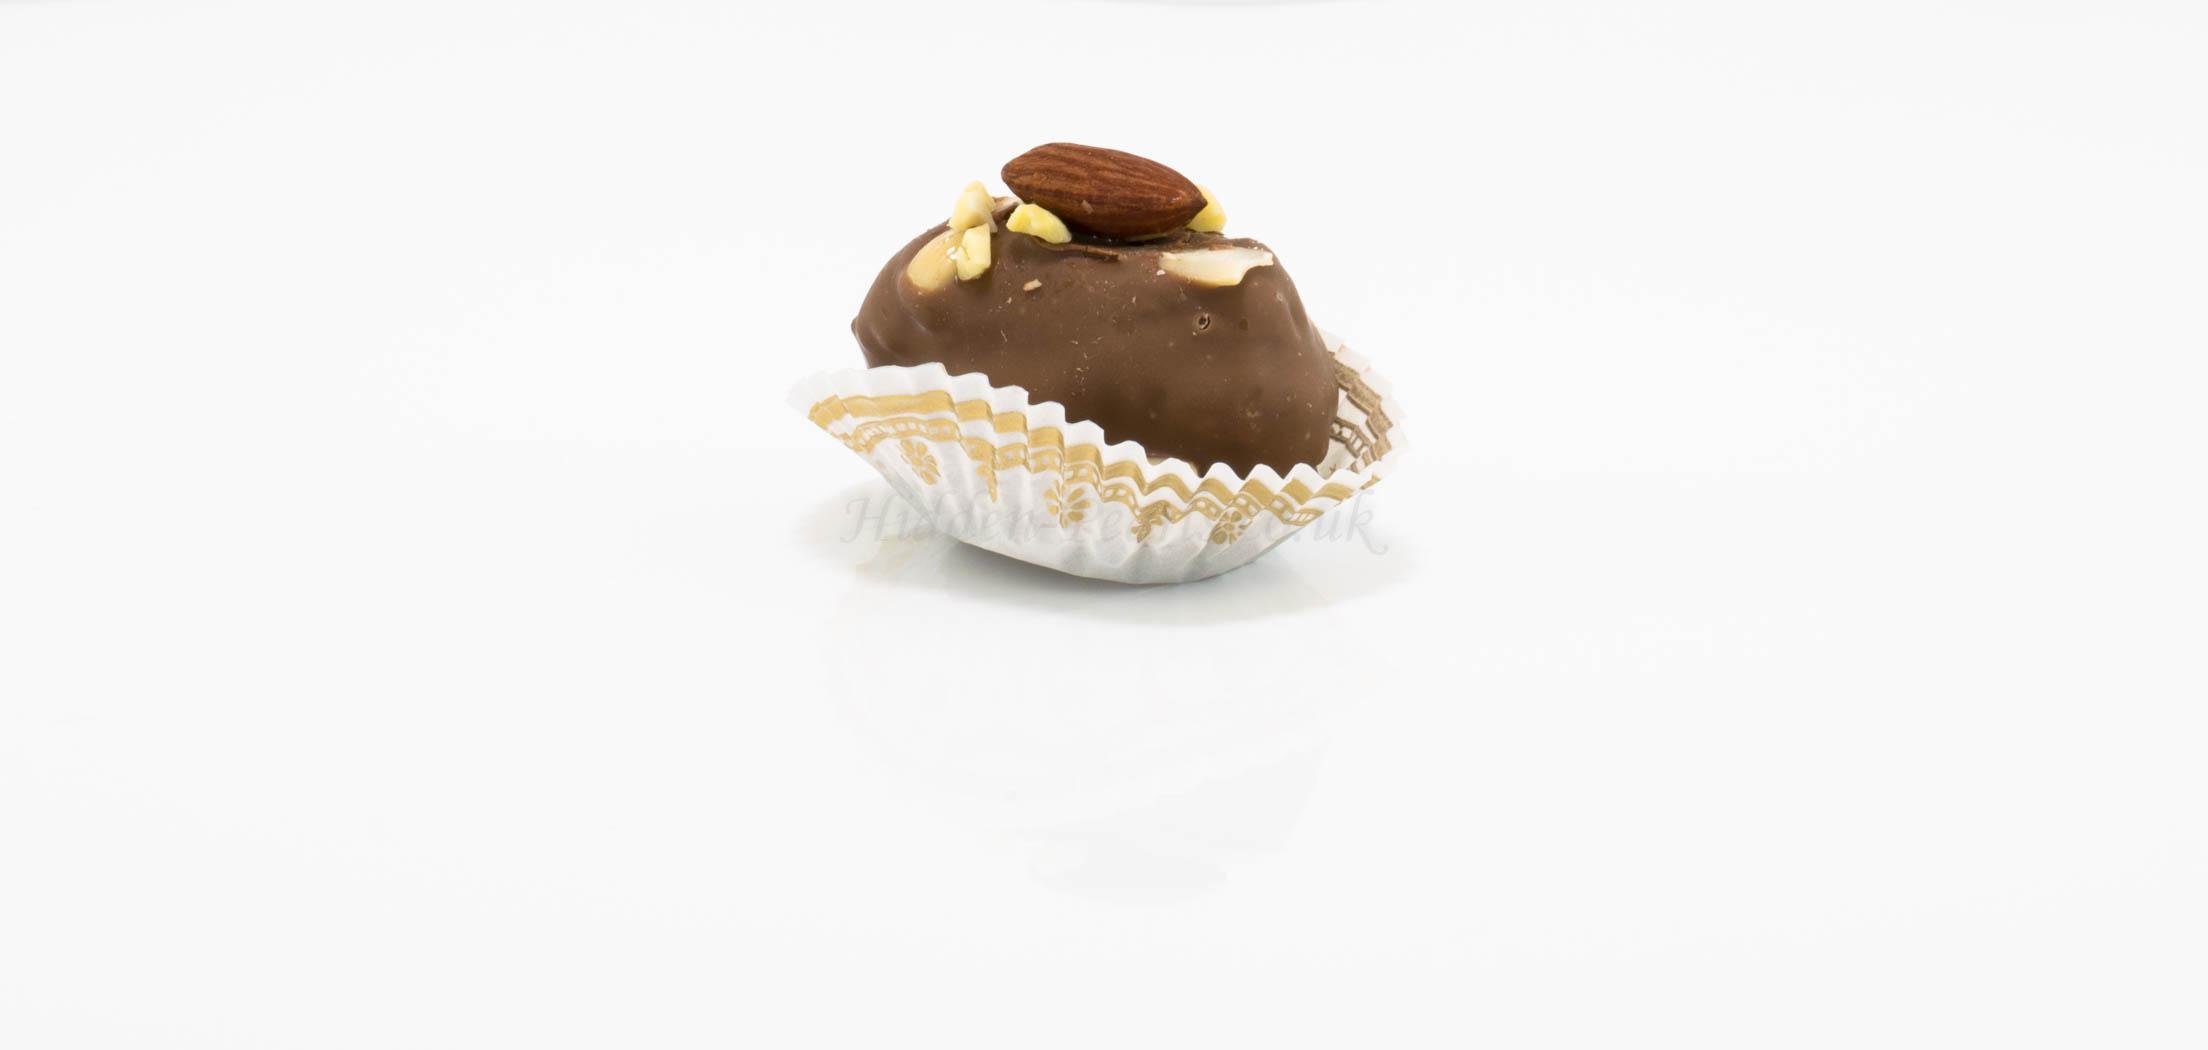 Roasted Almond Milk Chocolate Date